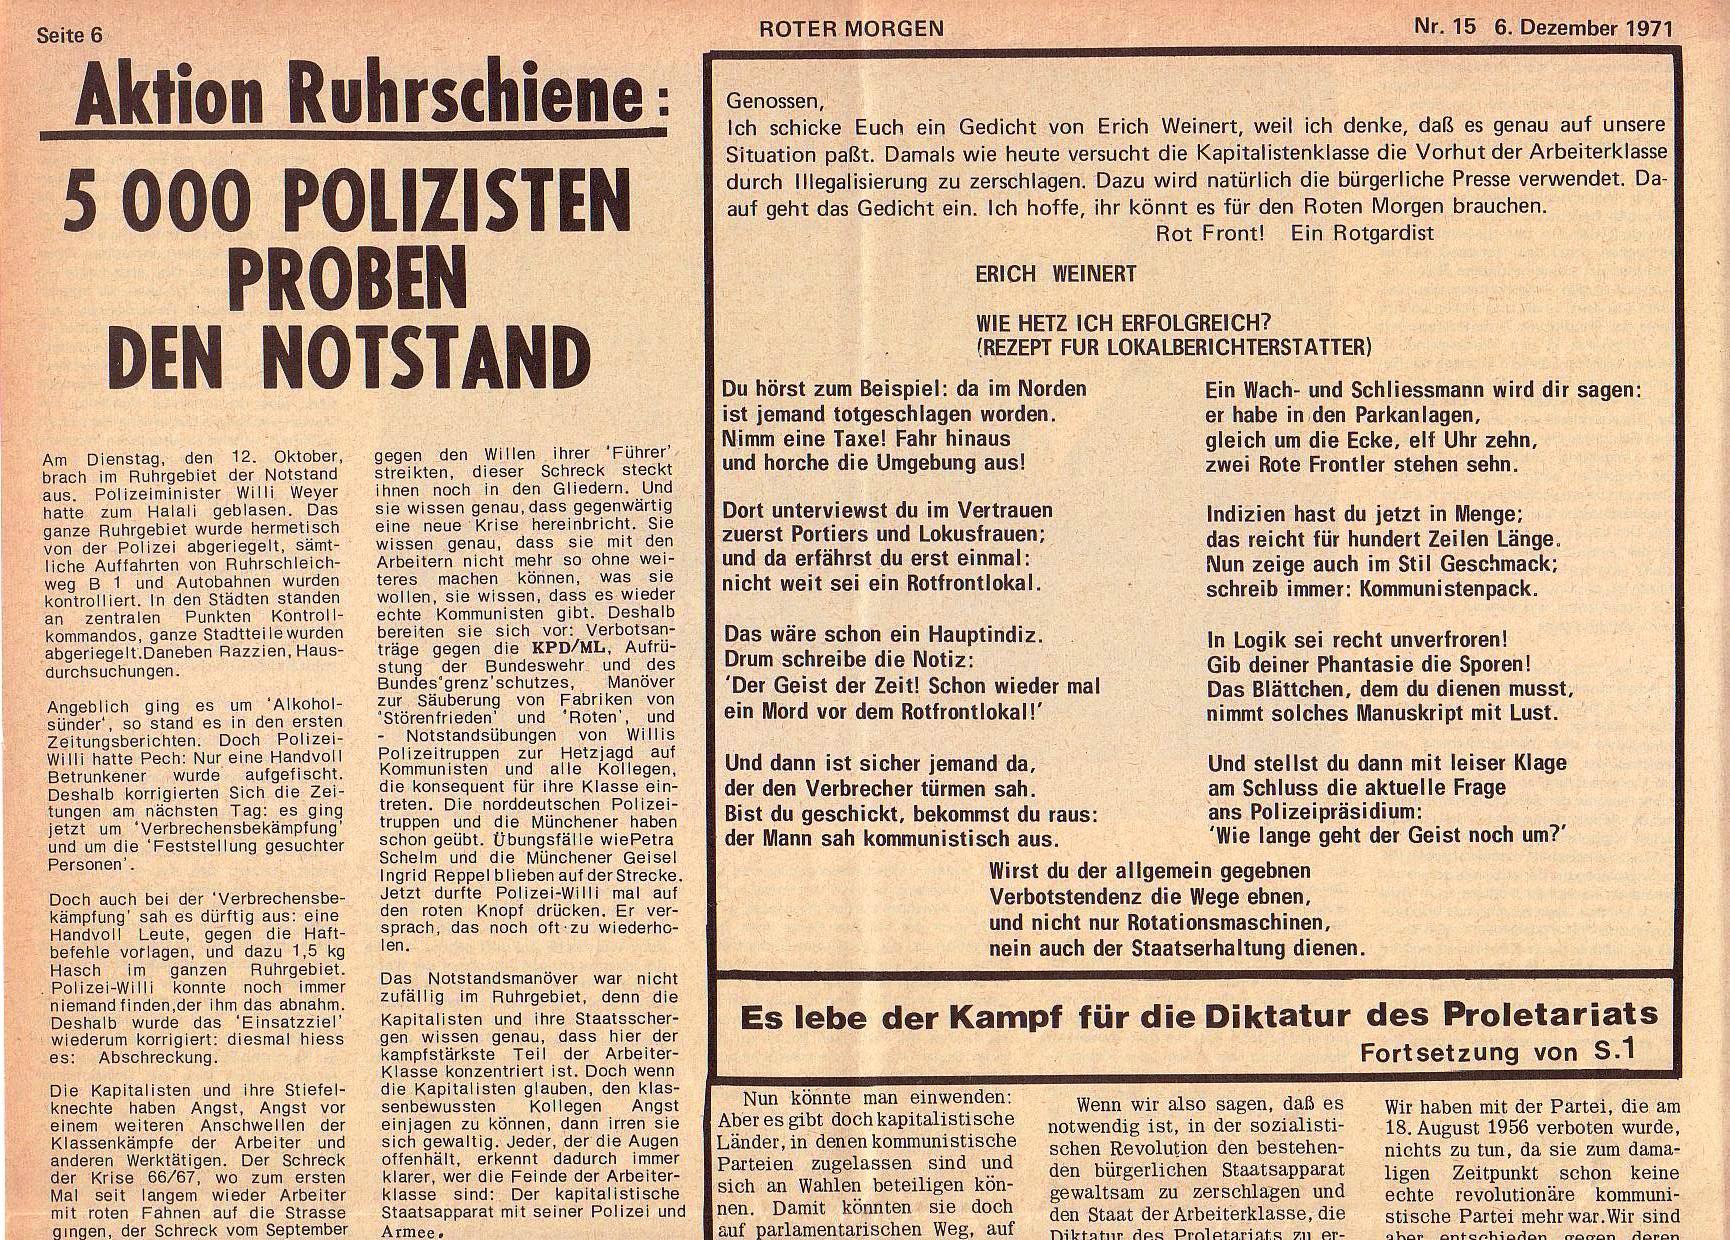 Roter Morgen, 5. Jg., 6. Dezember 1971, Nr. 15, Seite 6a